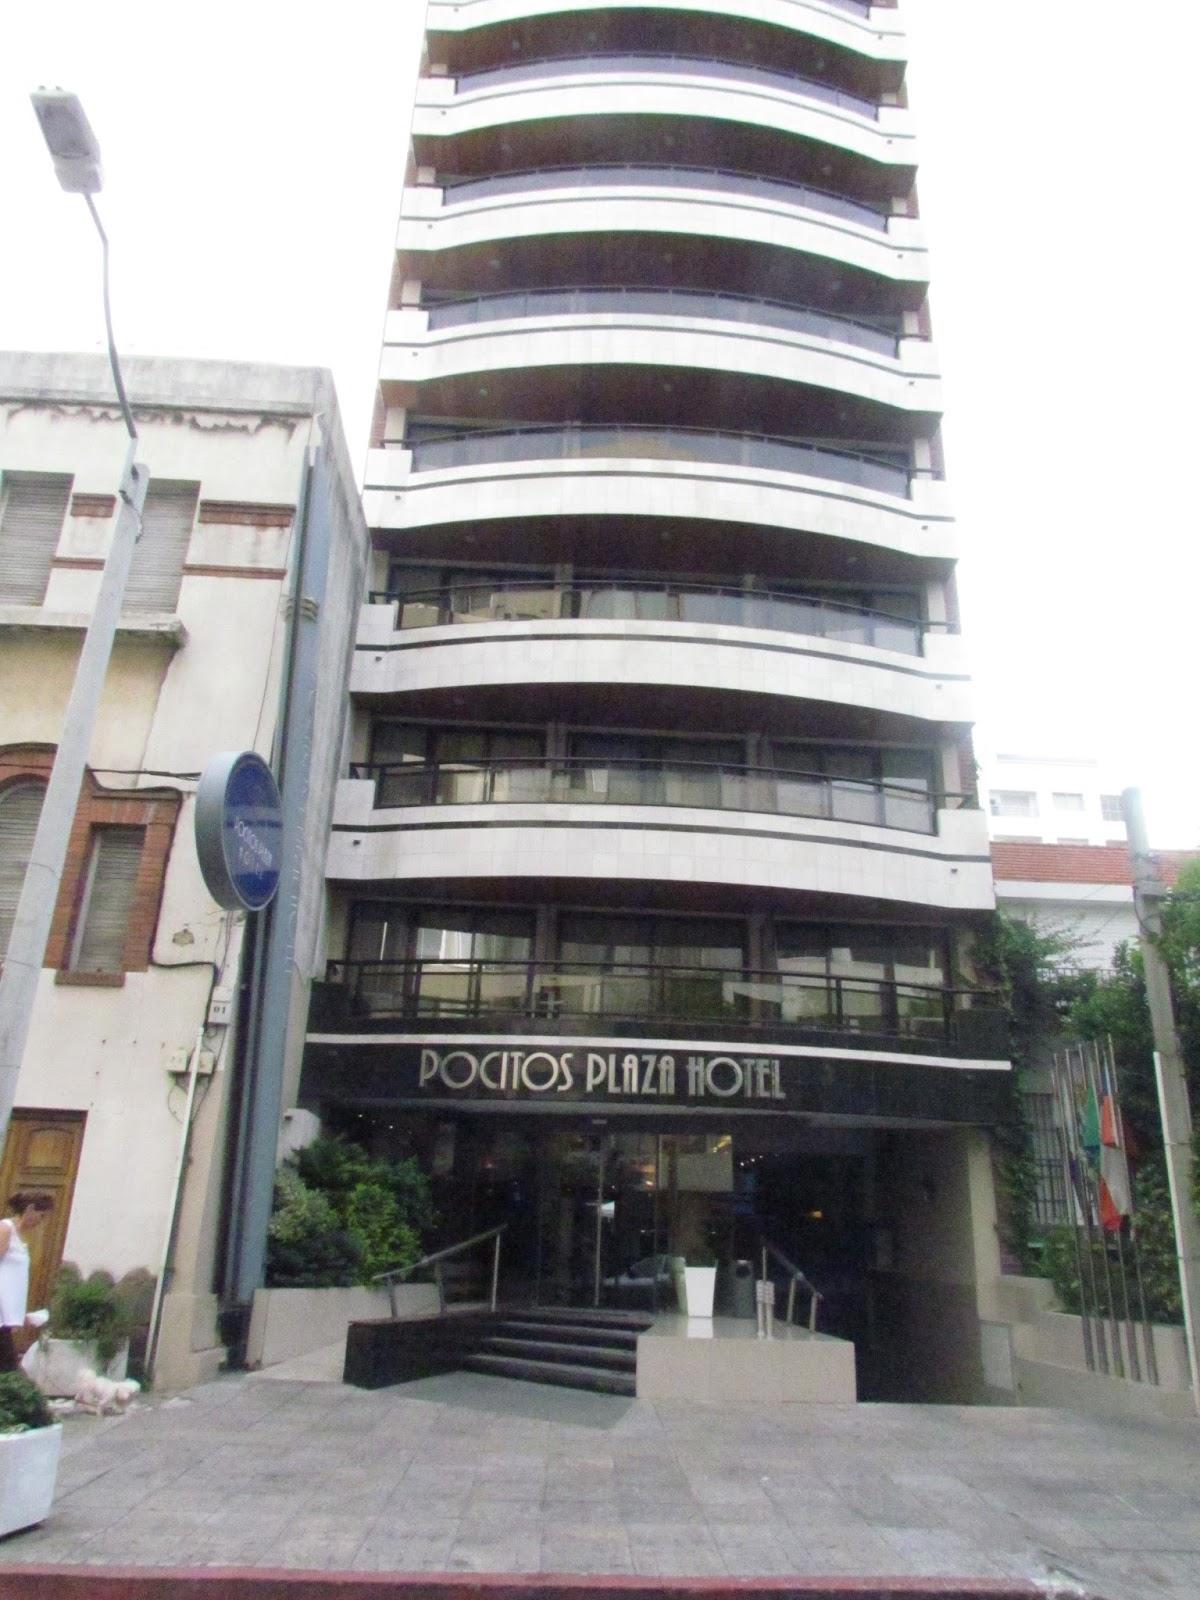 pocitos plaza montevideu